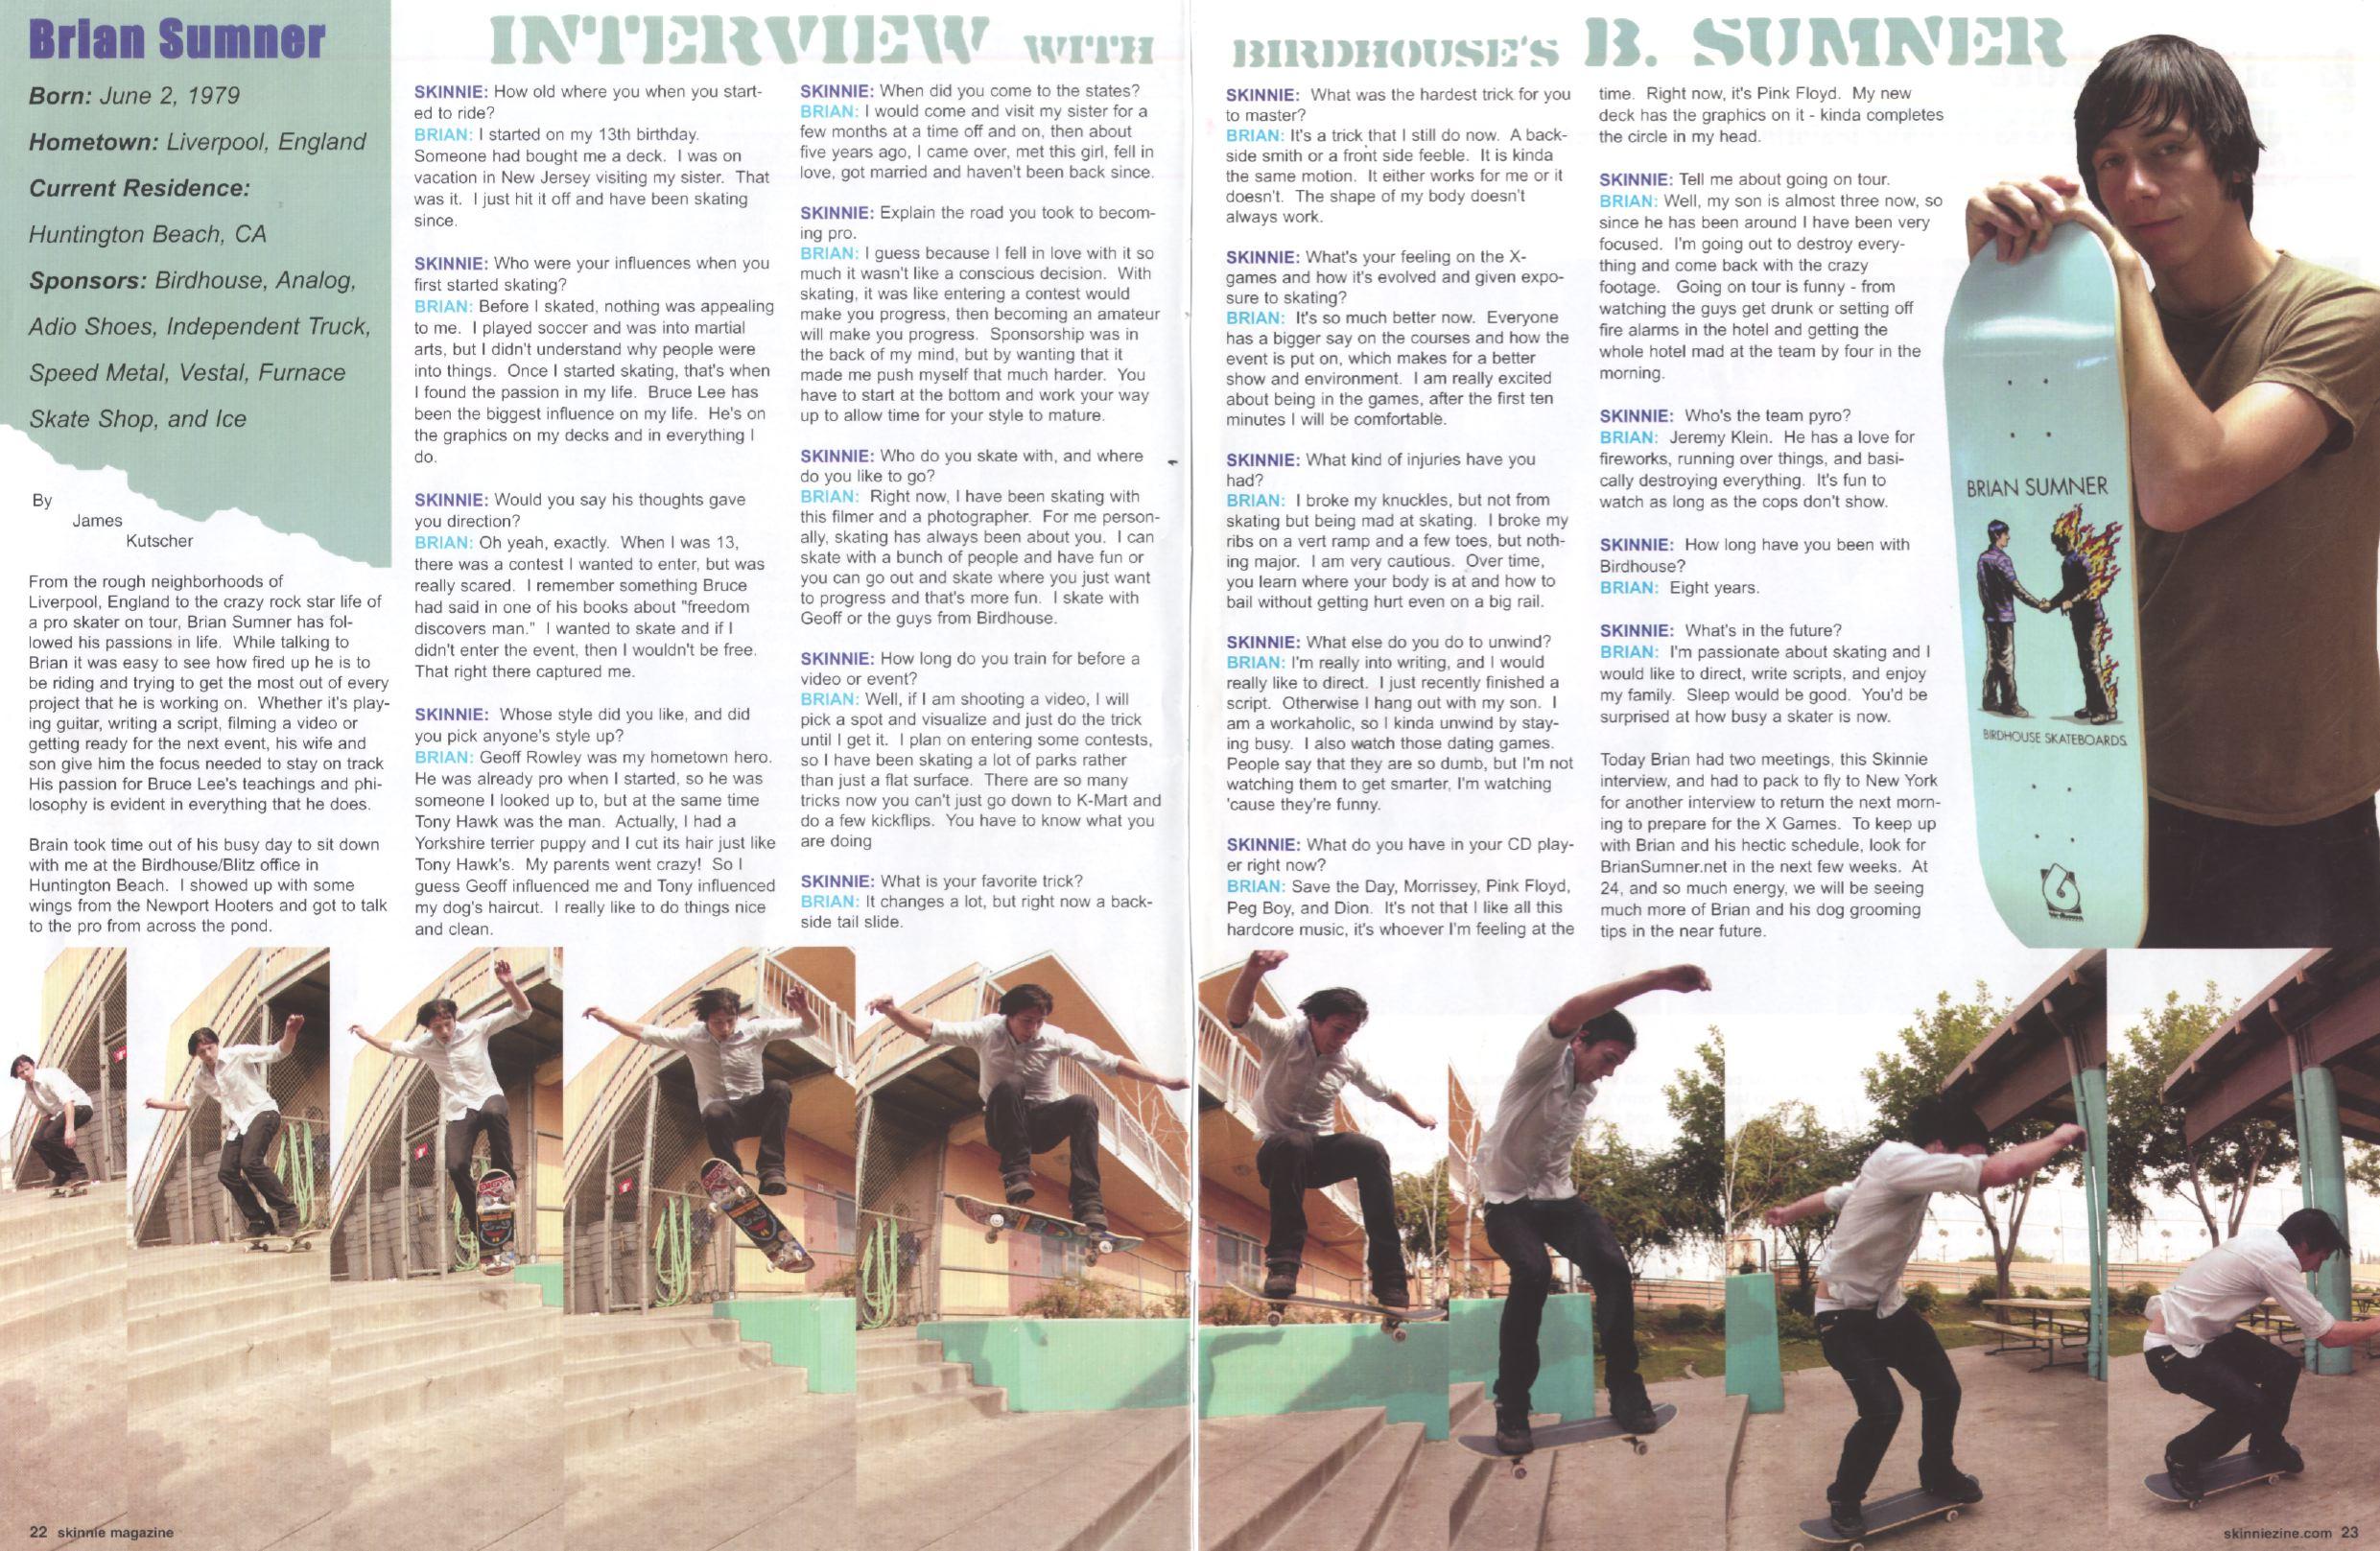 130 Skinny interview